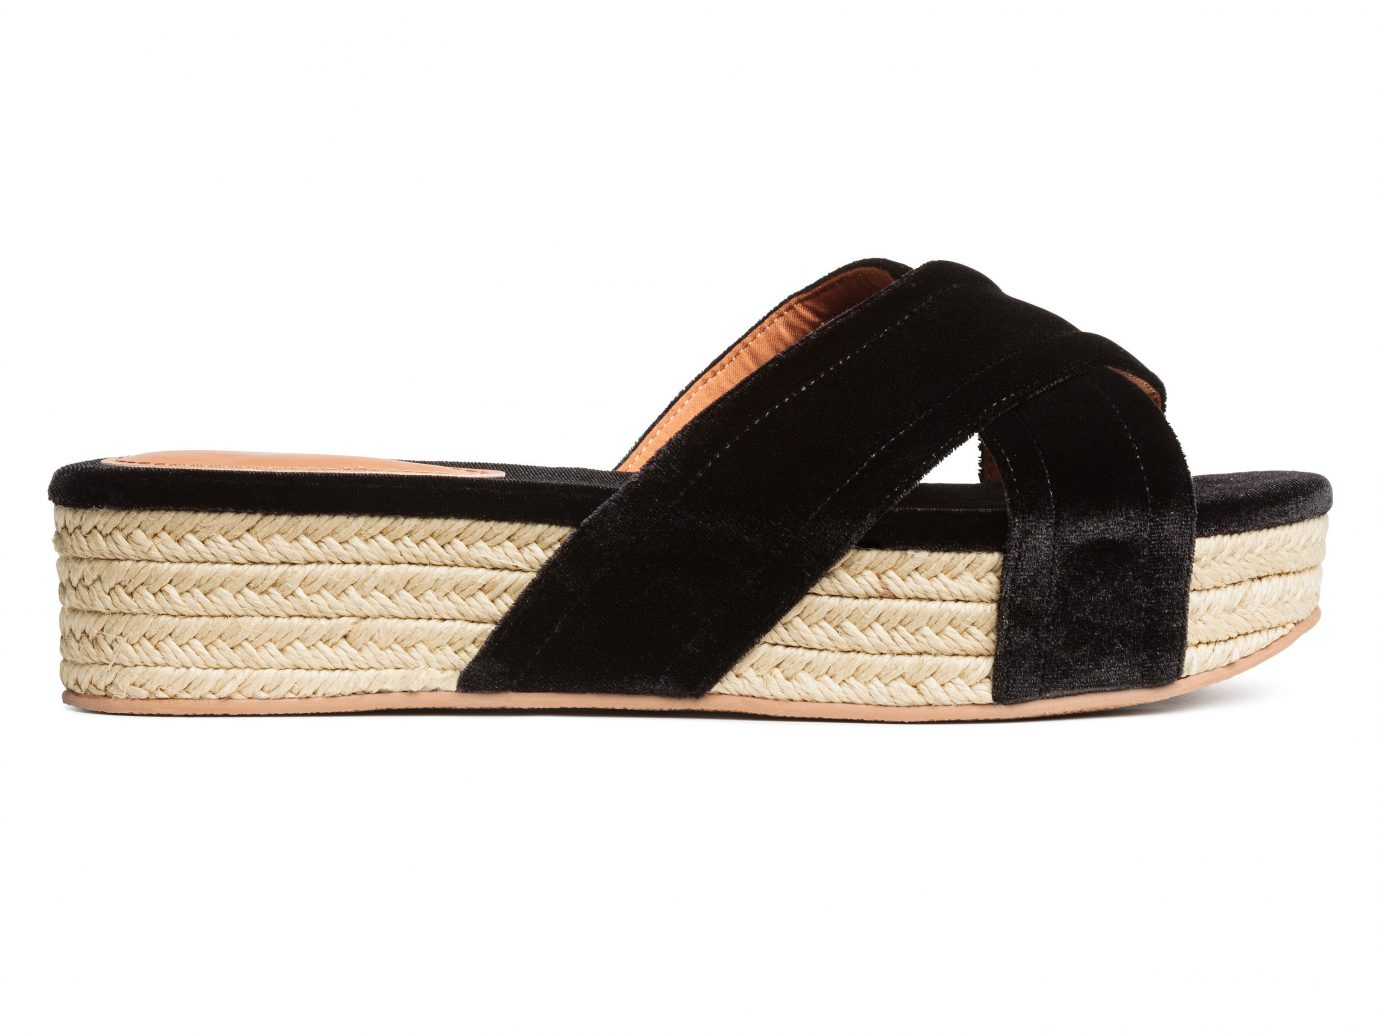 Style + Design footwear shoe product sandal outdoor shoe slide sandal beige